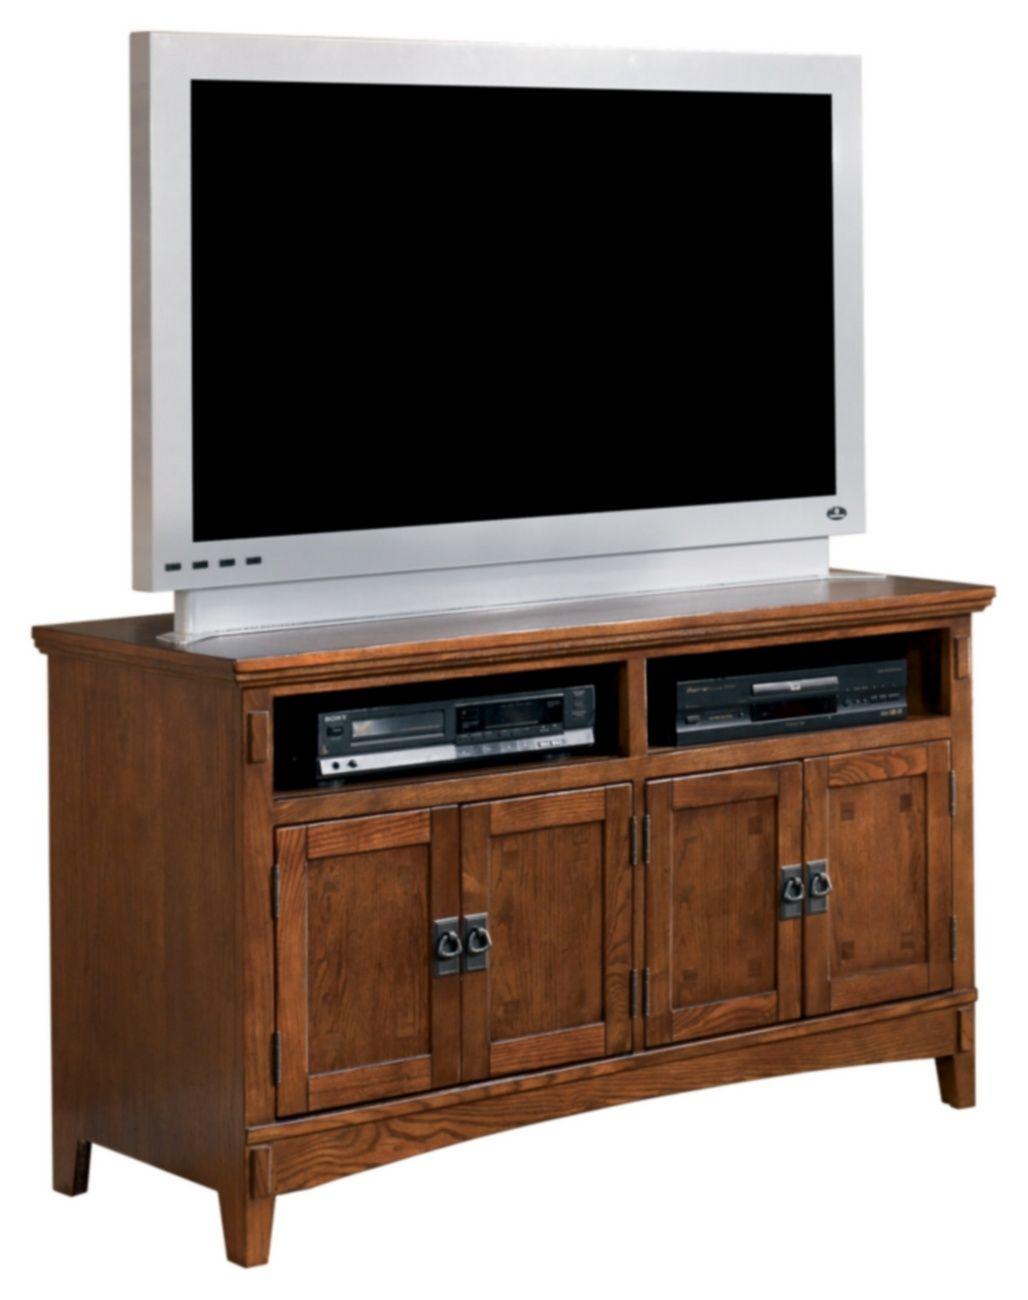 Pin By Rebecca Yochim On Craftsman Mission Style Tv Stand Craftsman Style Furniture Tv Stand